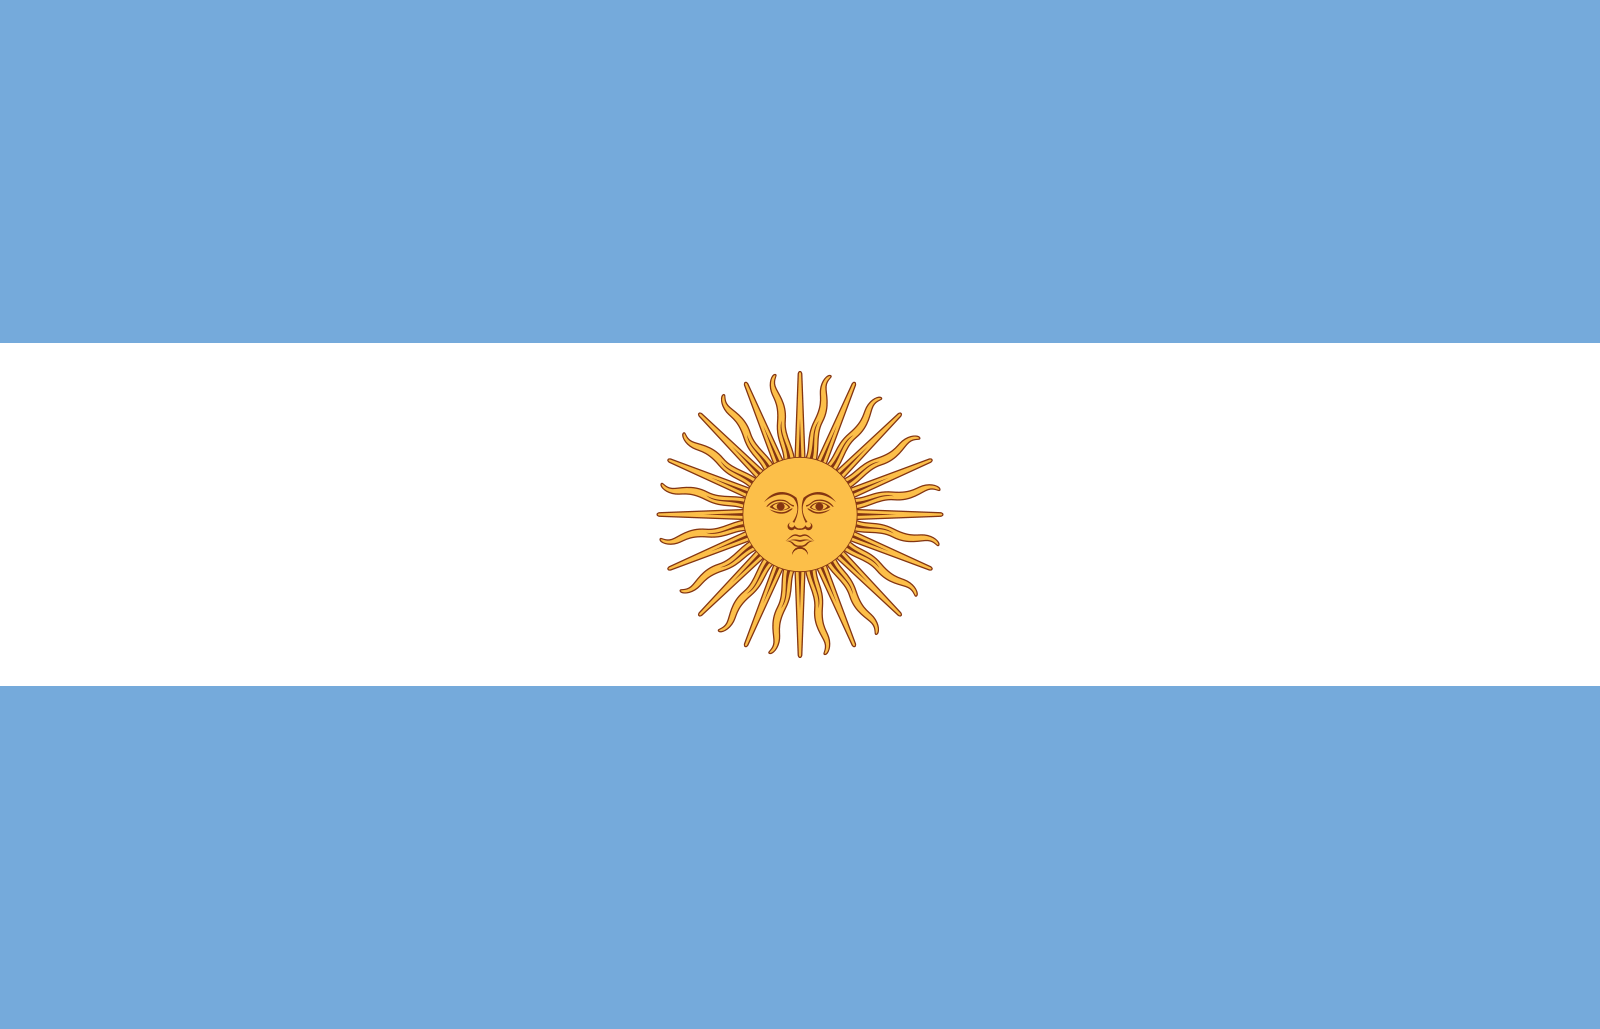 BANDERA ARGENTINA ACTUAL